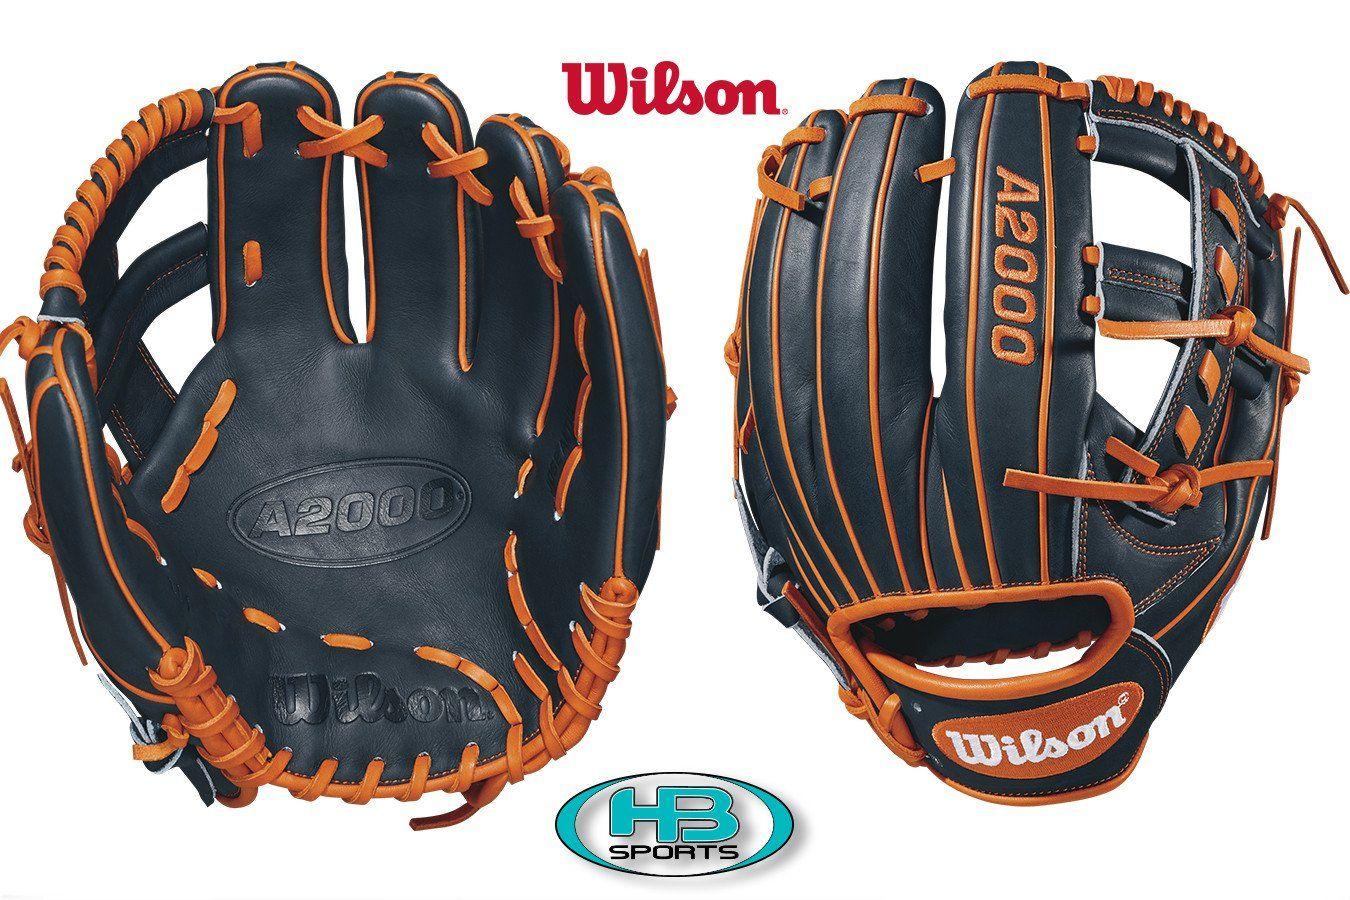 "Wilson A2000 11.5"" Jose Altuve Baseball Glove"